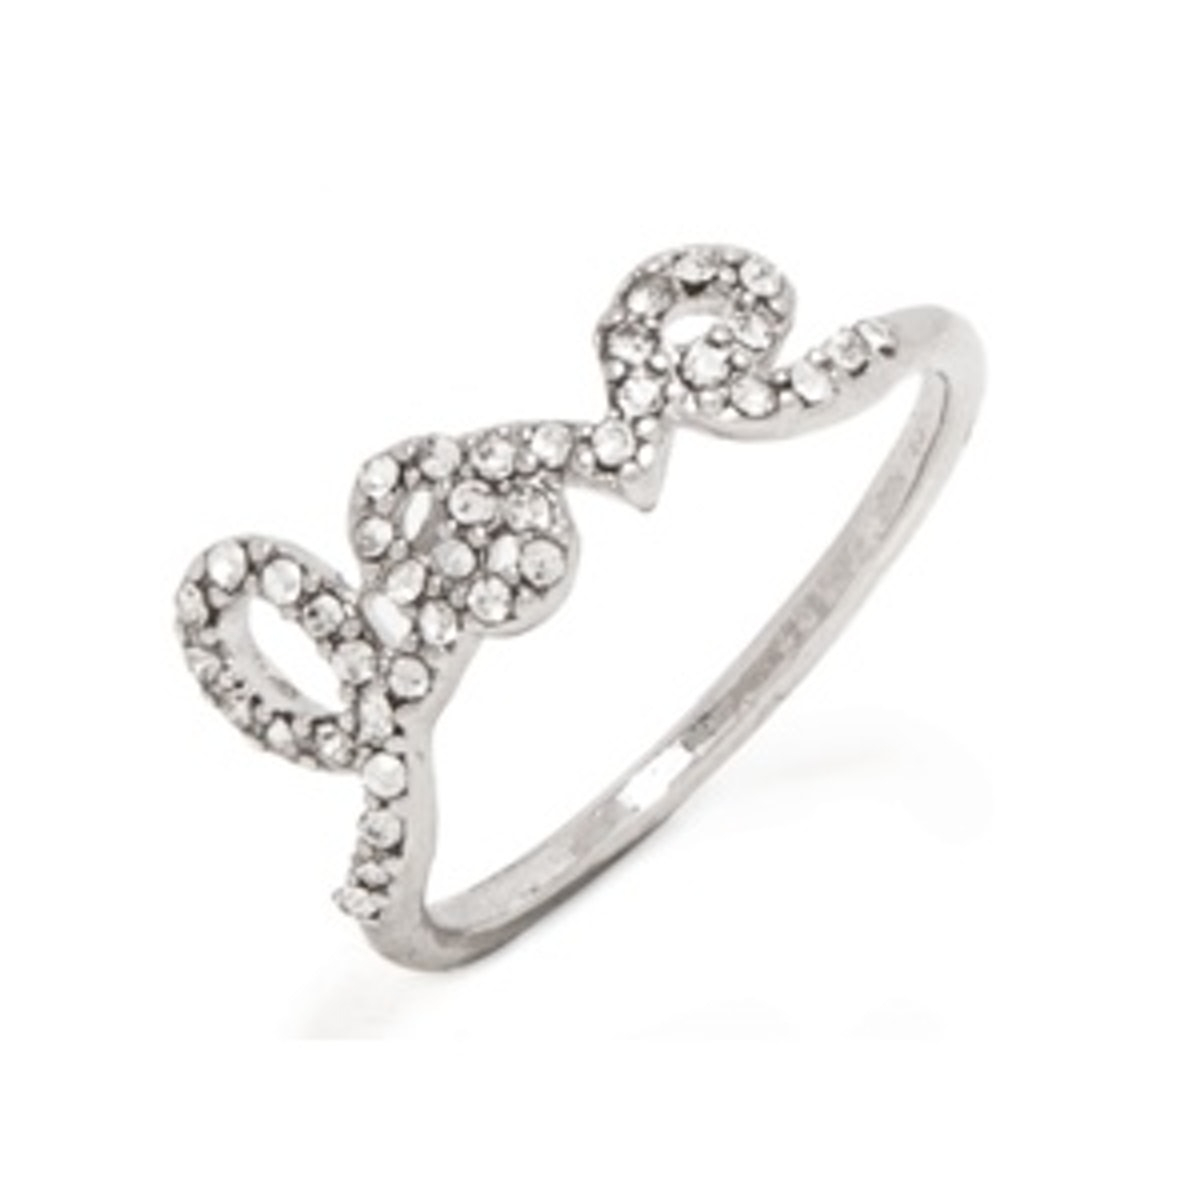 Cursive Pave Love Ring